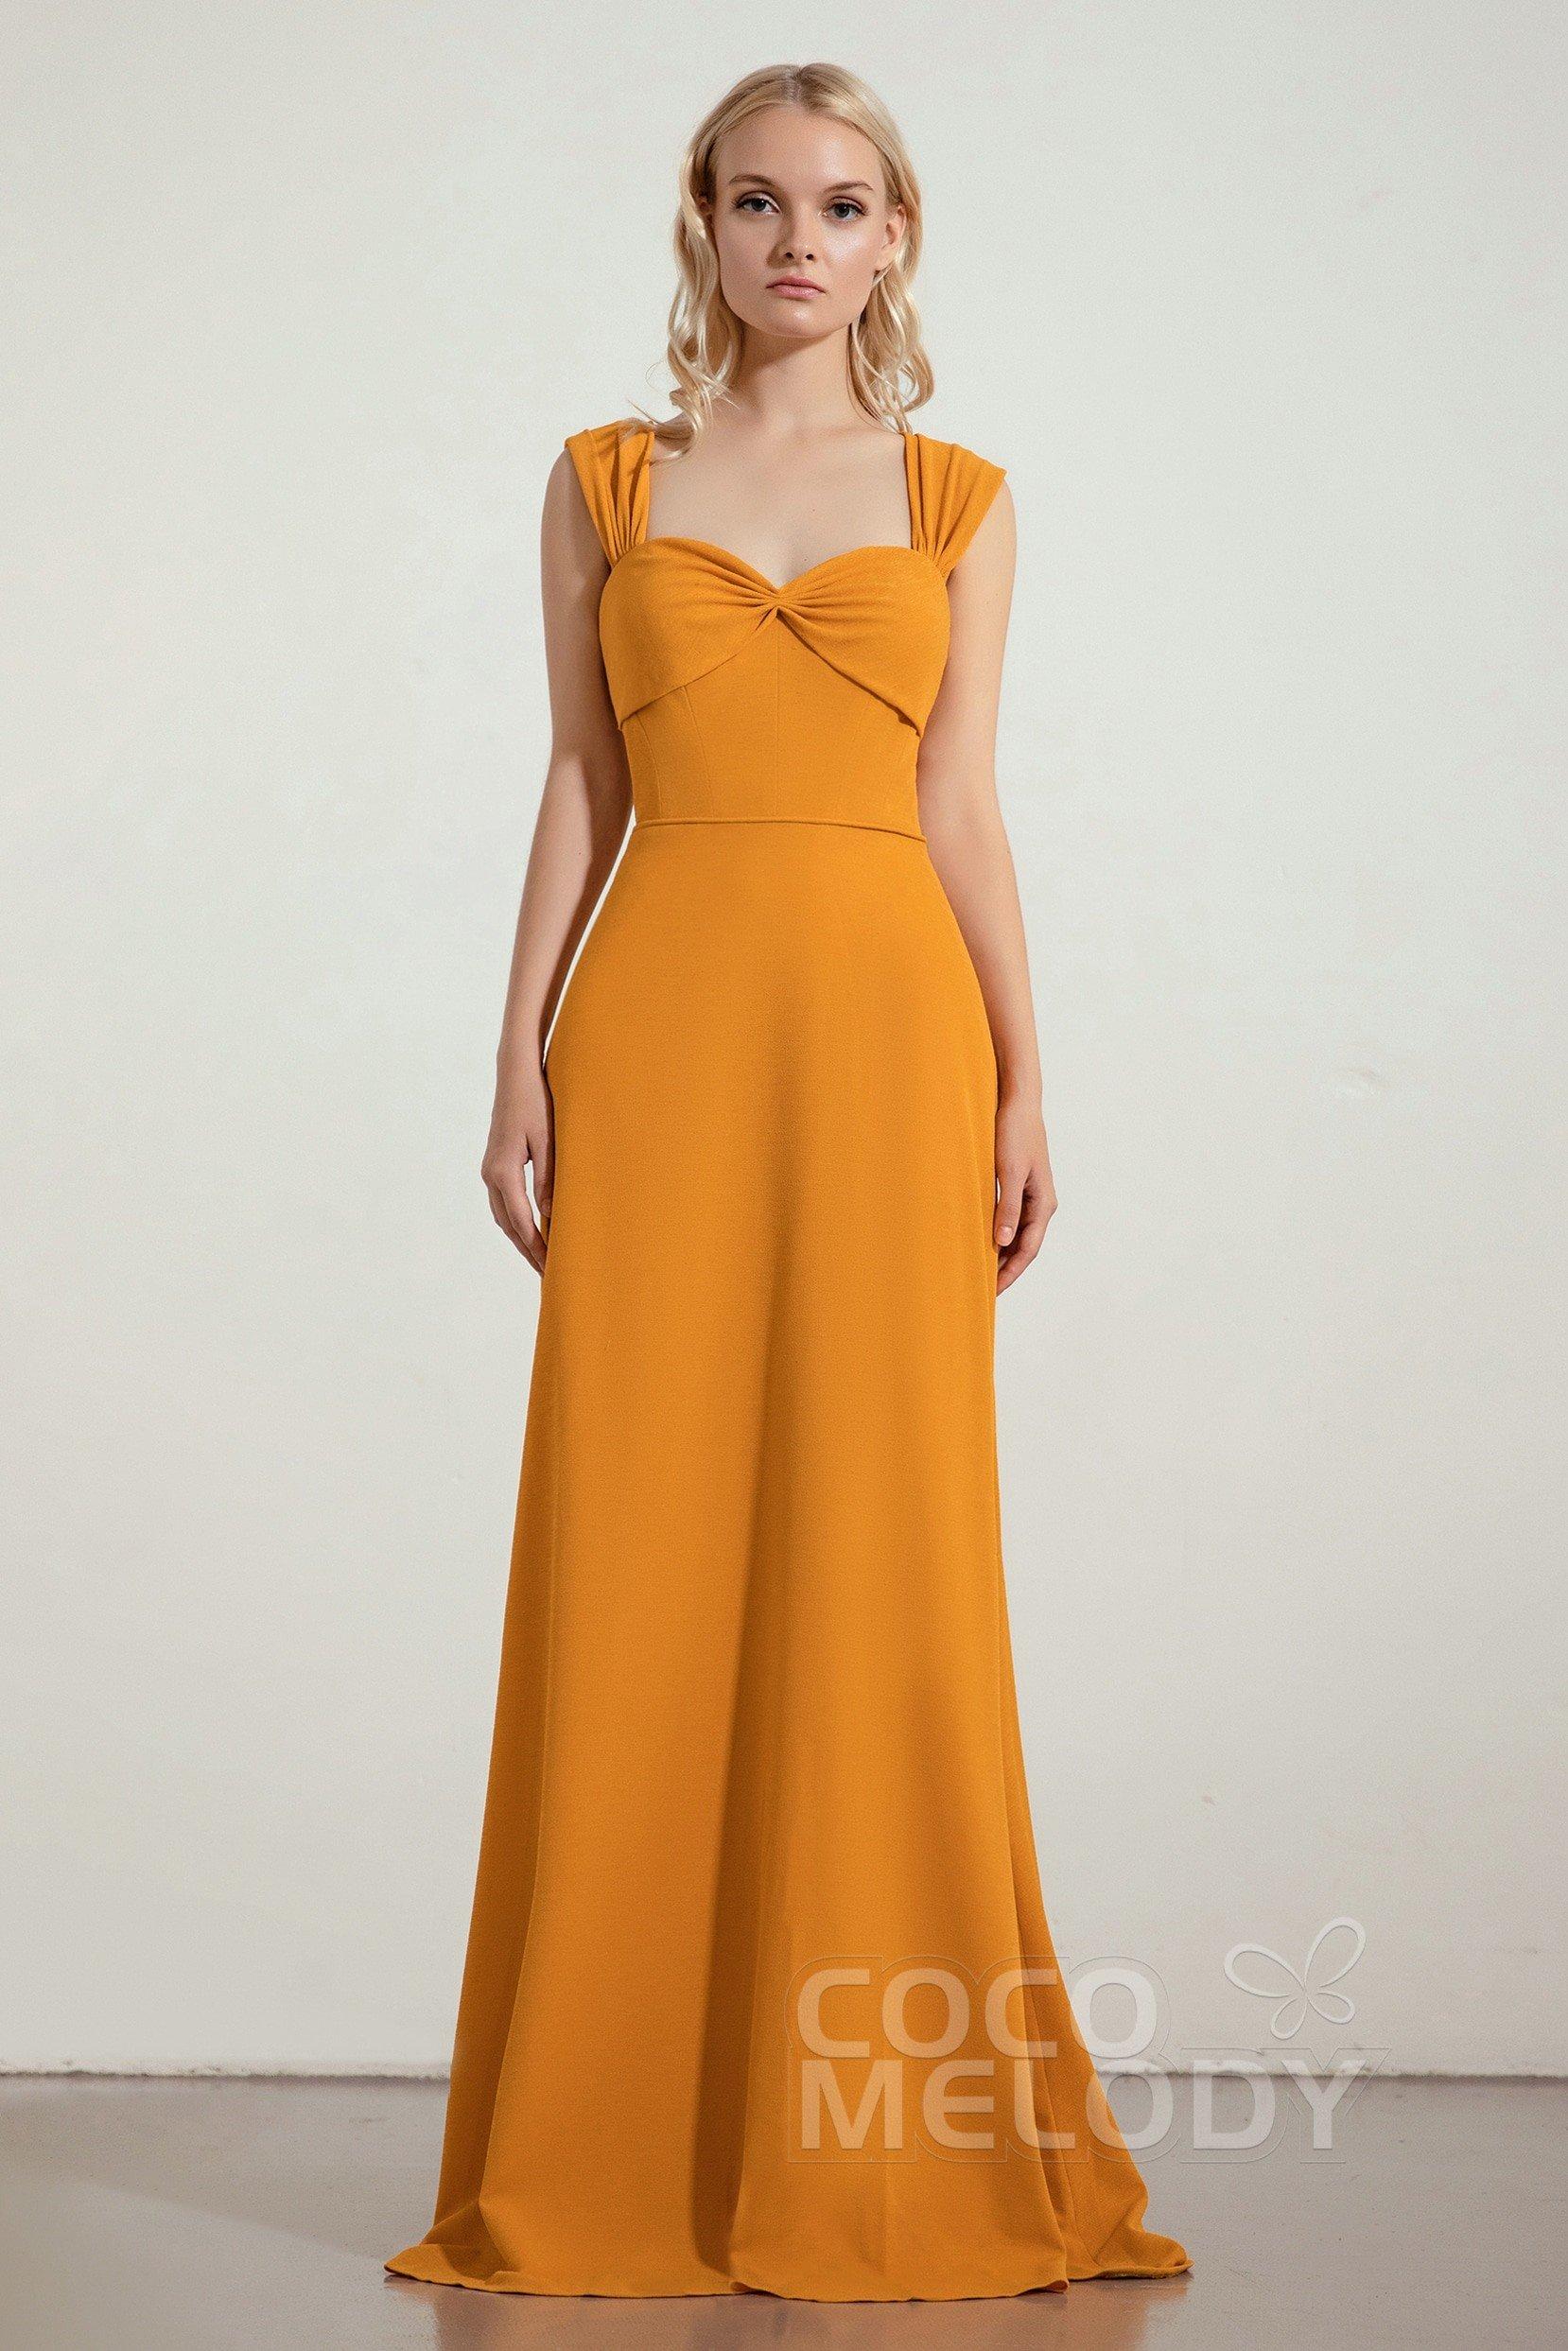 d81d4da95cdc Where To Buy Fabric For Bridesmaid Dresses - raveitsafe